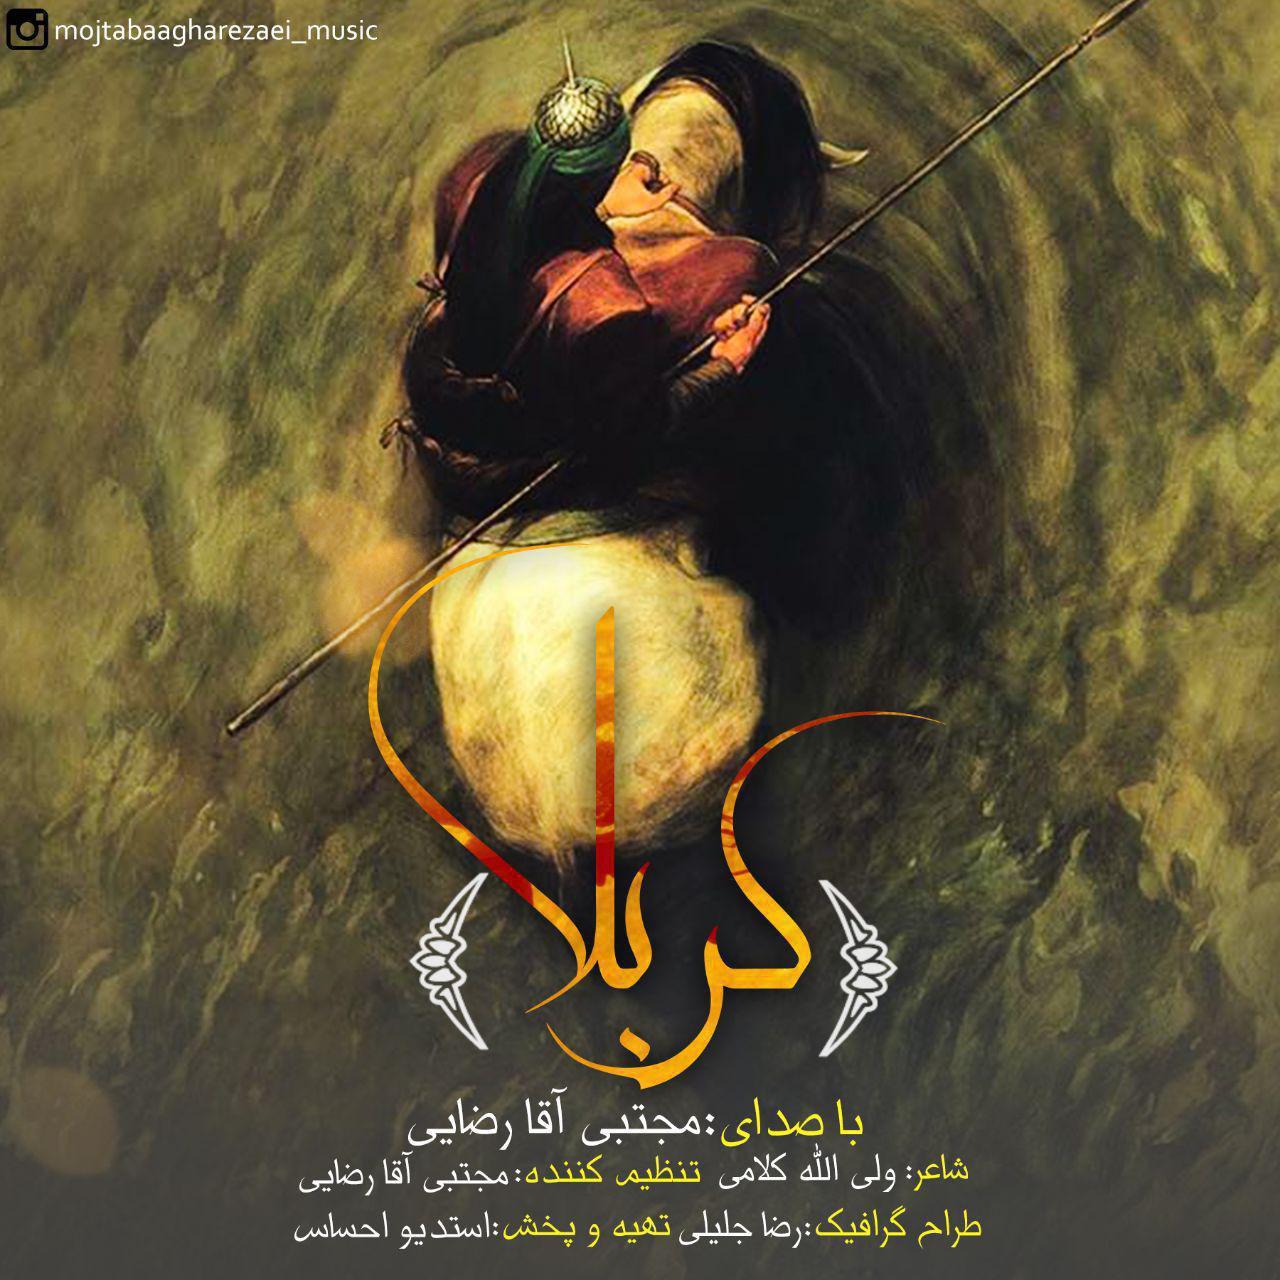 http://s5.picofile.com/file/8371747076/11Mojtaba_Agharezaei_Karbala.jpg